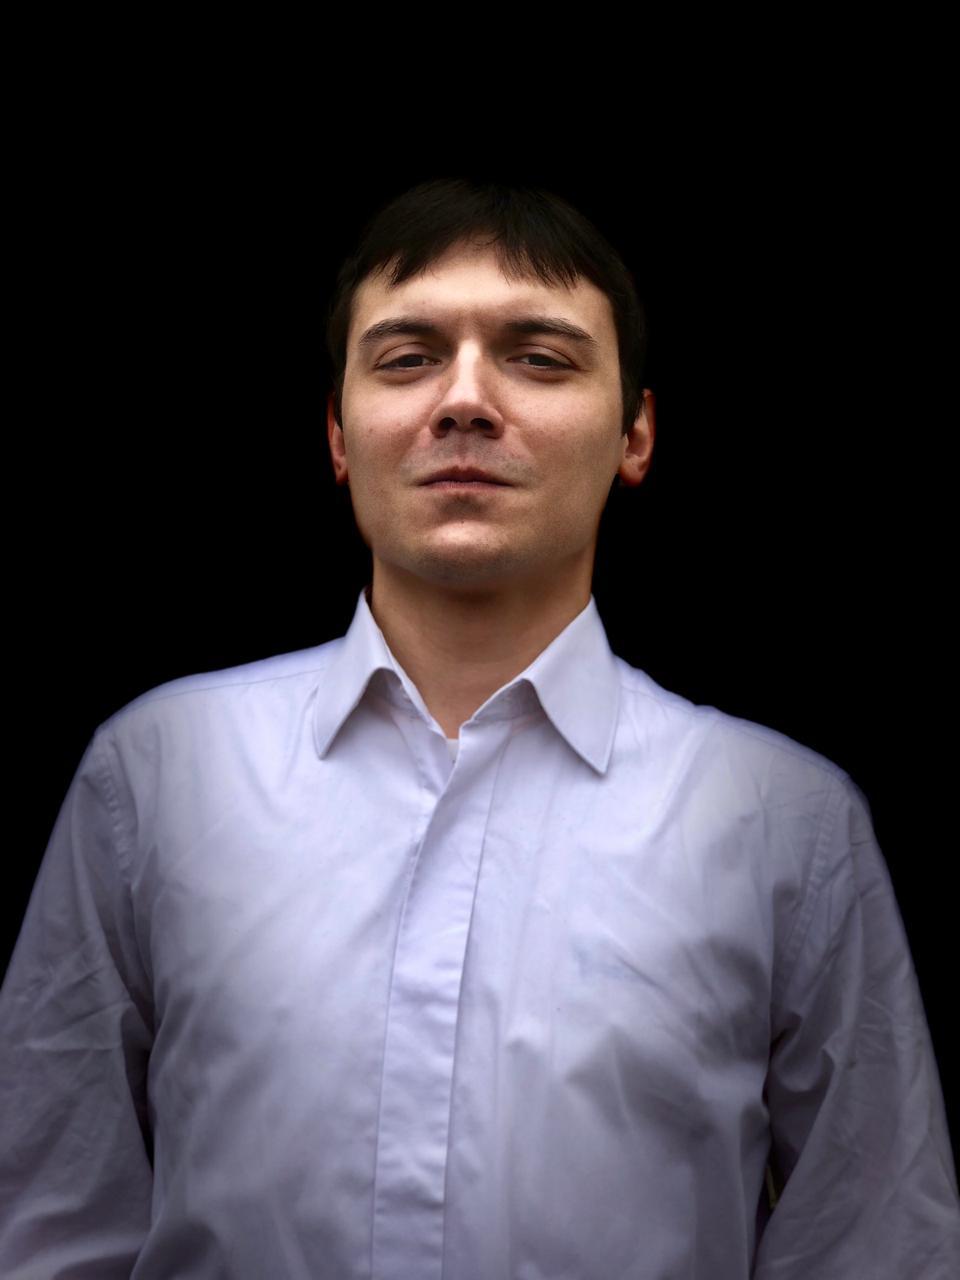 Григорий Занько